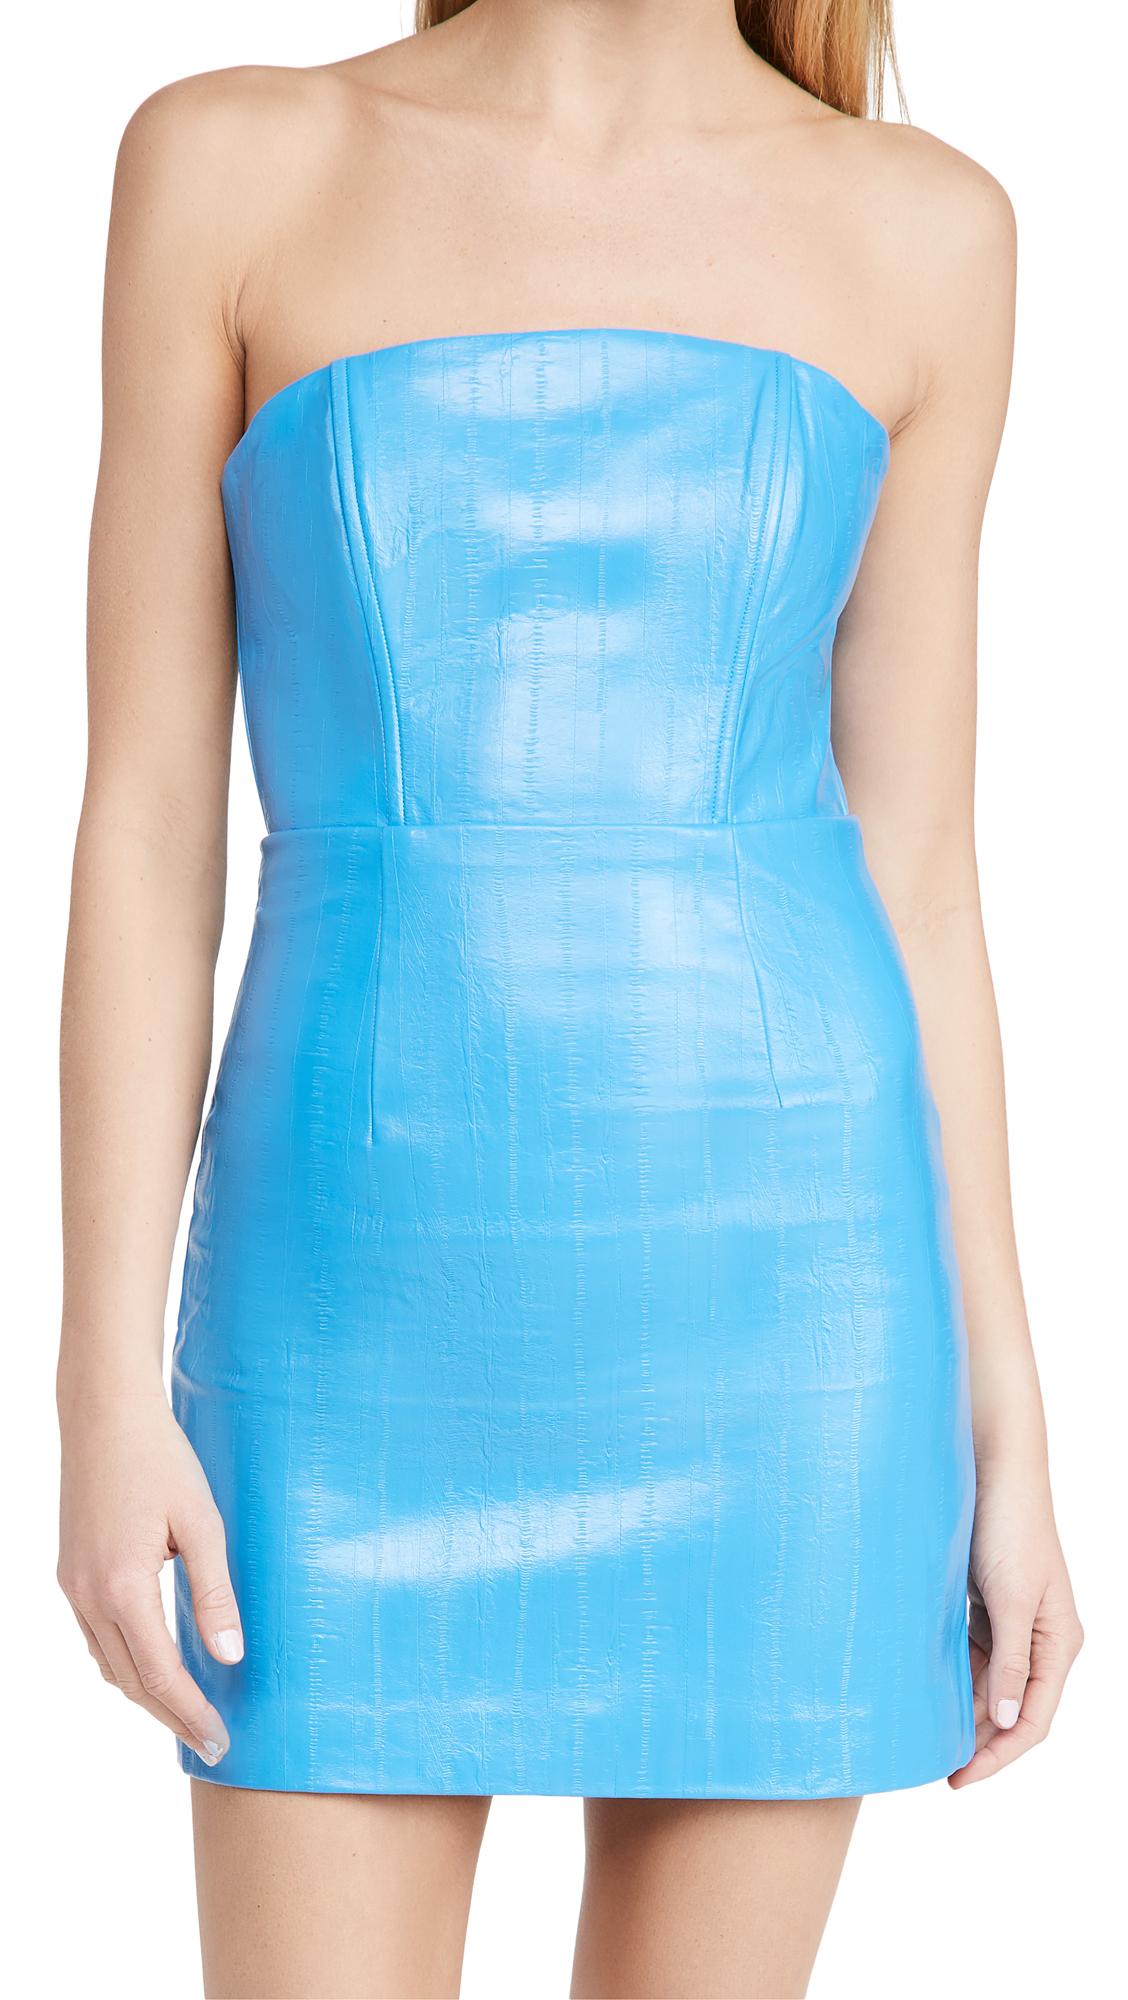 ROTATE Herla Corsage Dress